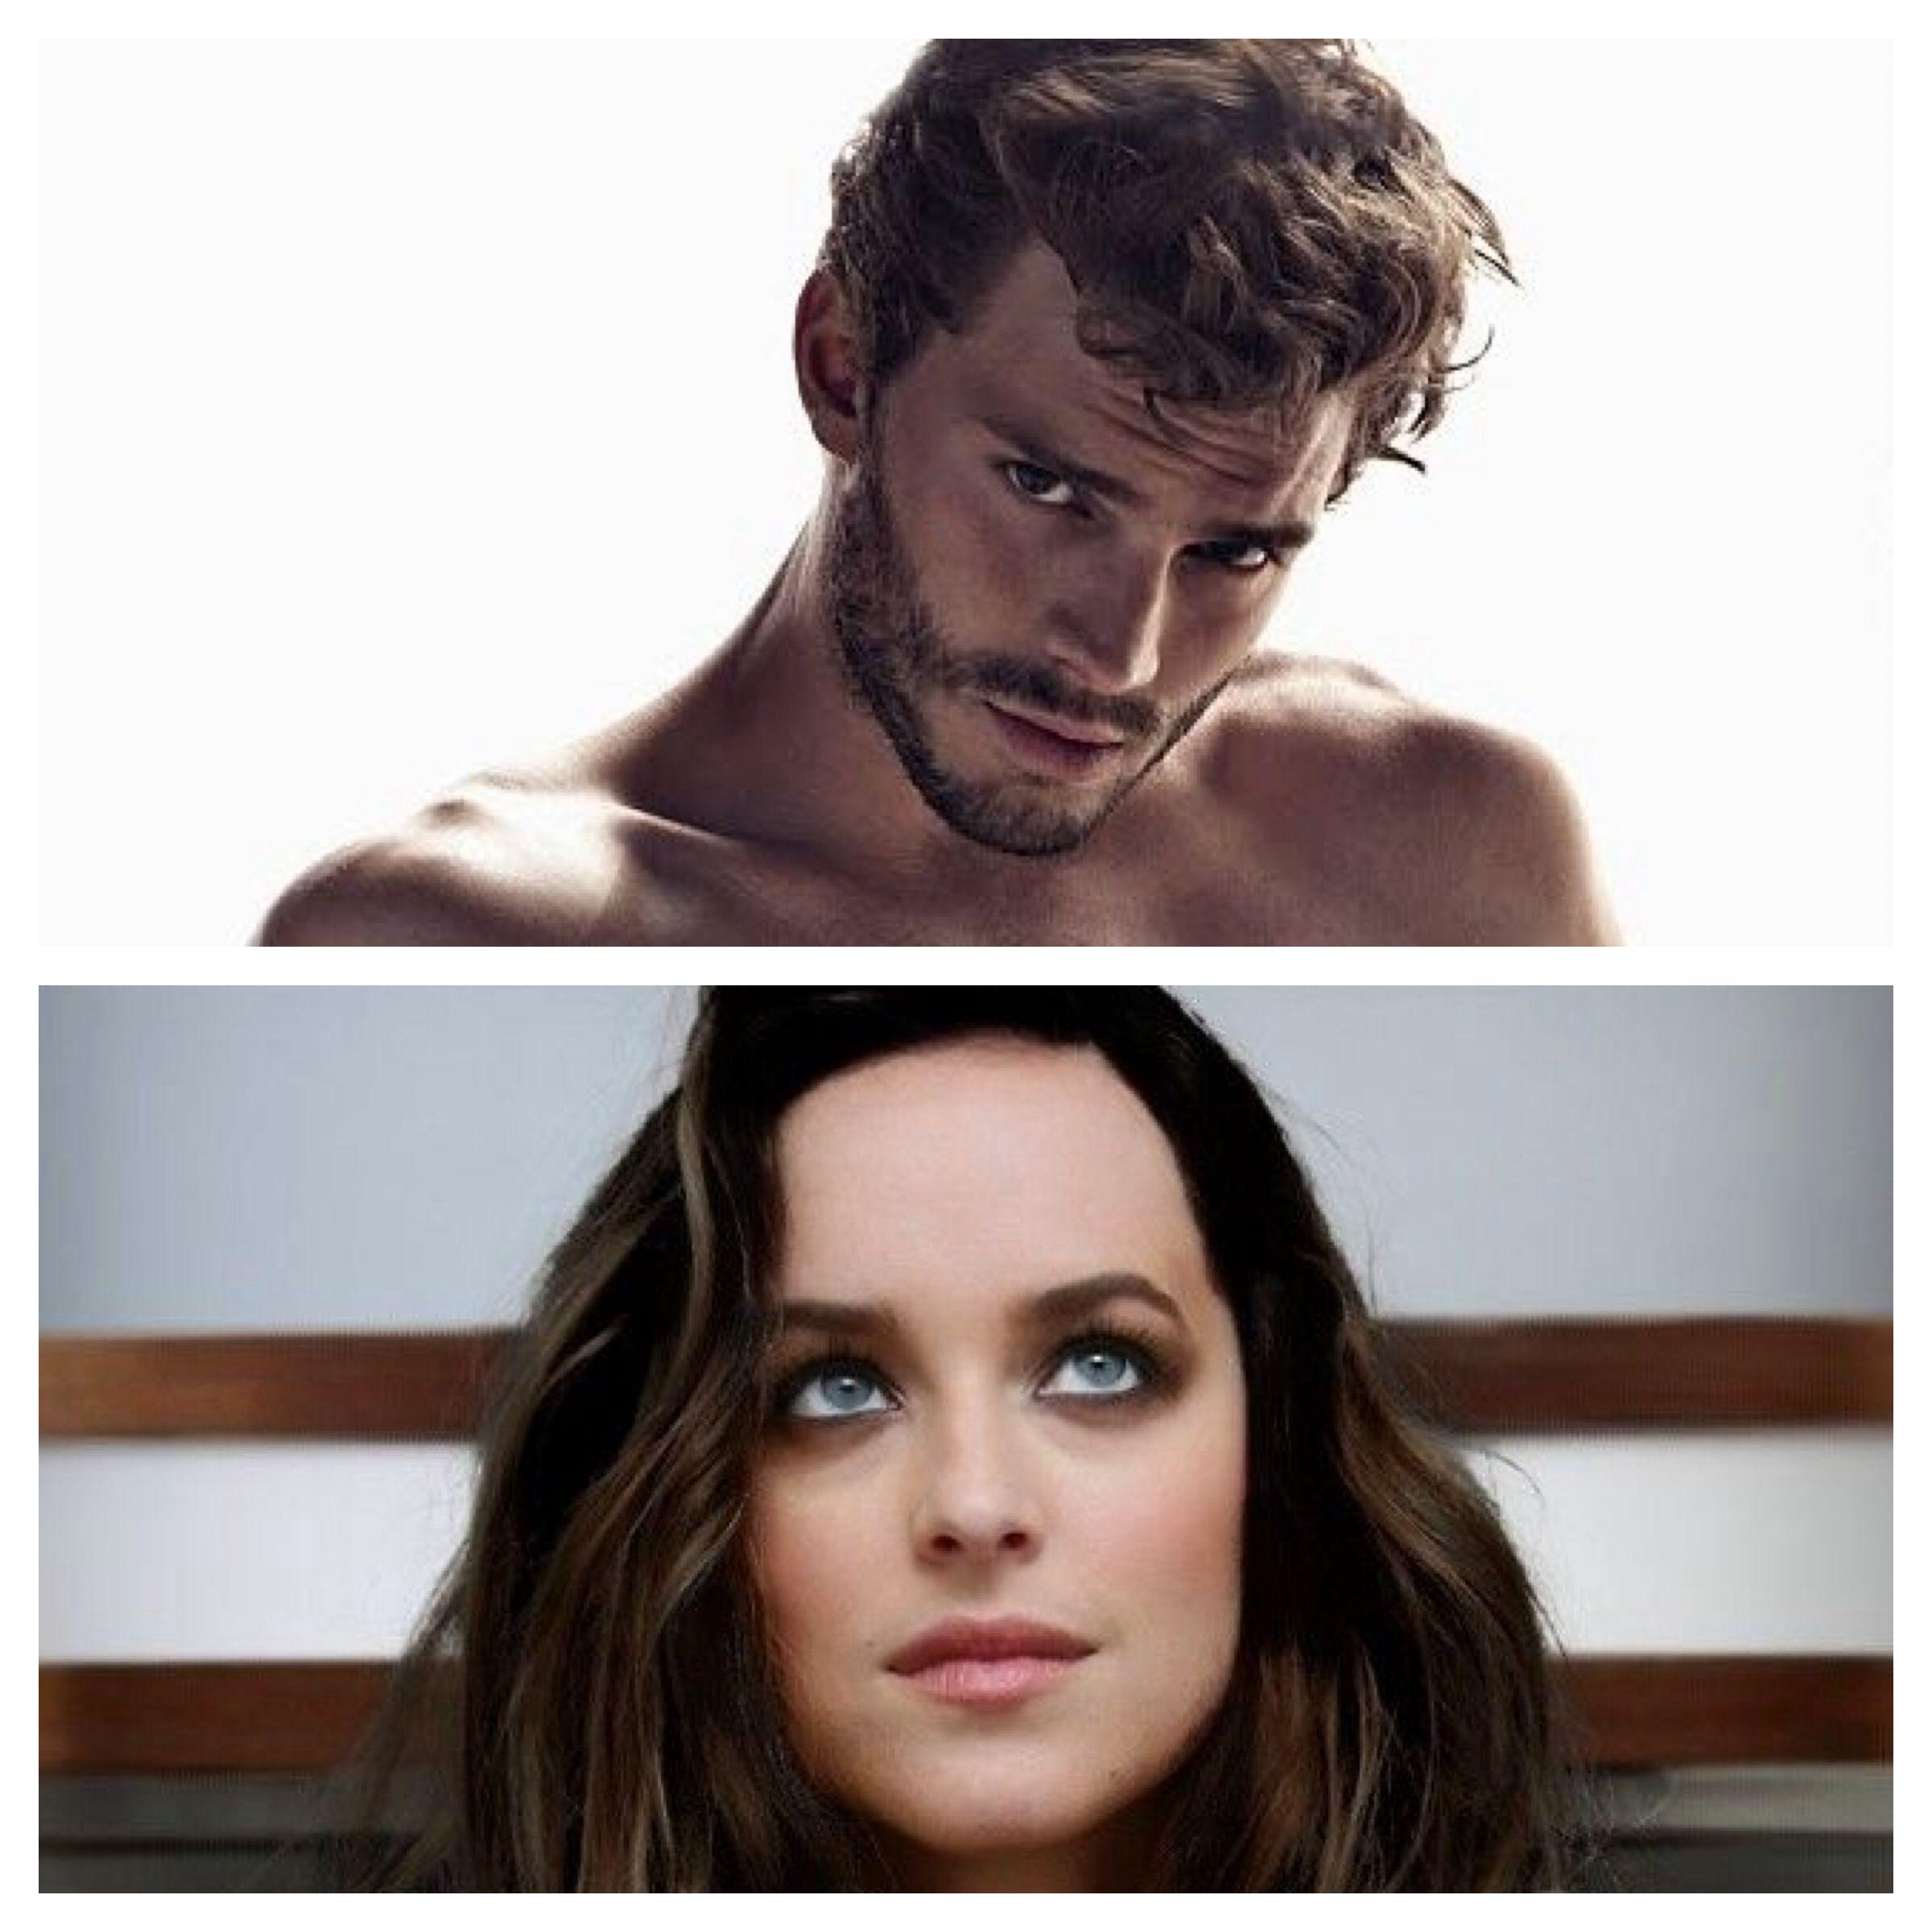 Jamie Dornan, Dakota Johnson - Christian Grey & Ana Steel, Fifty Shades of Grey